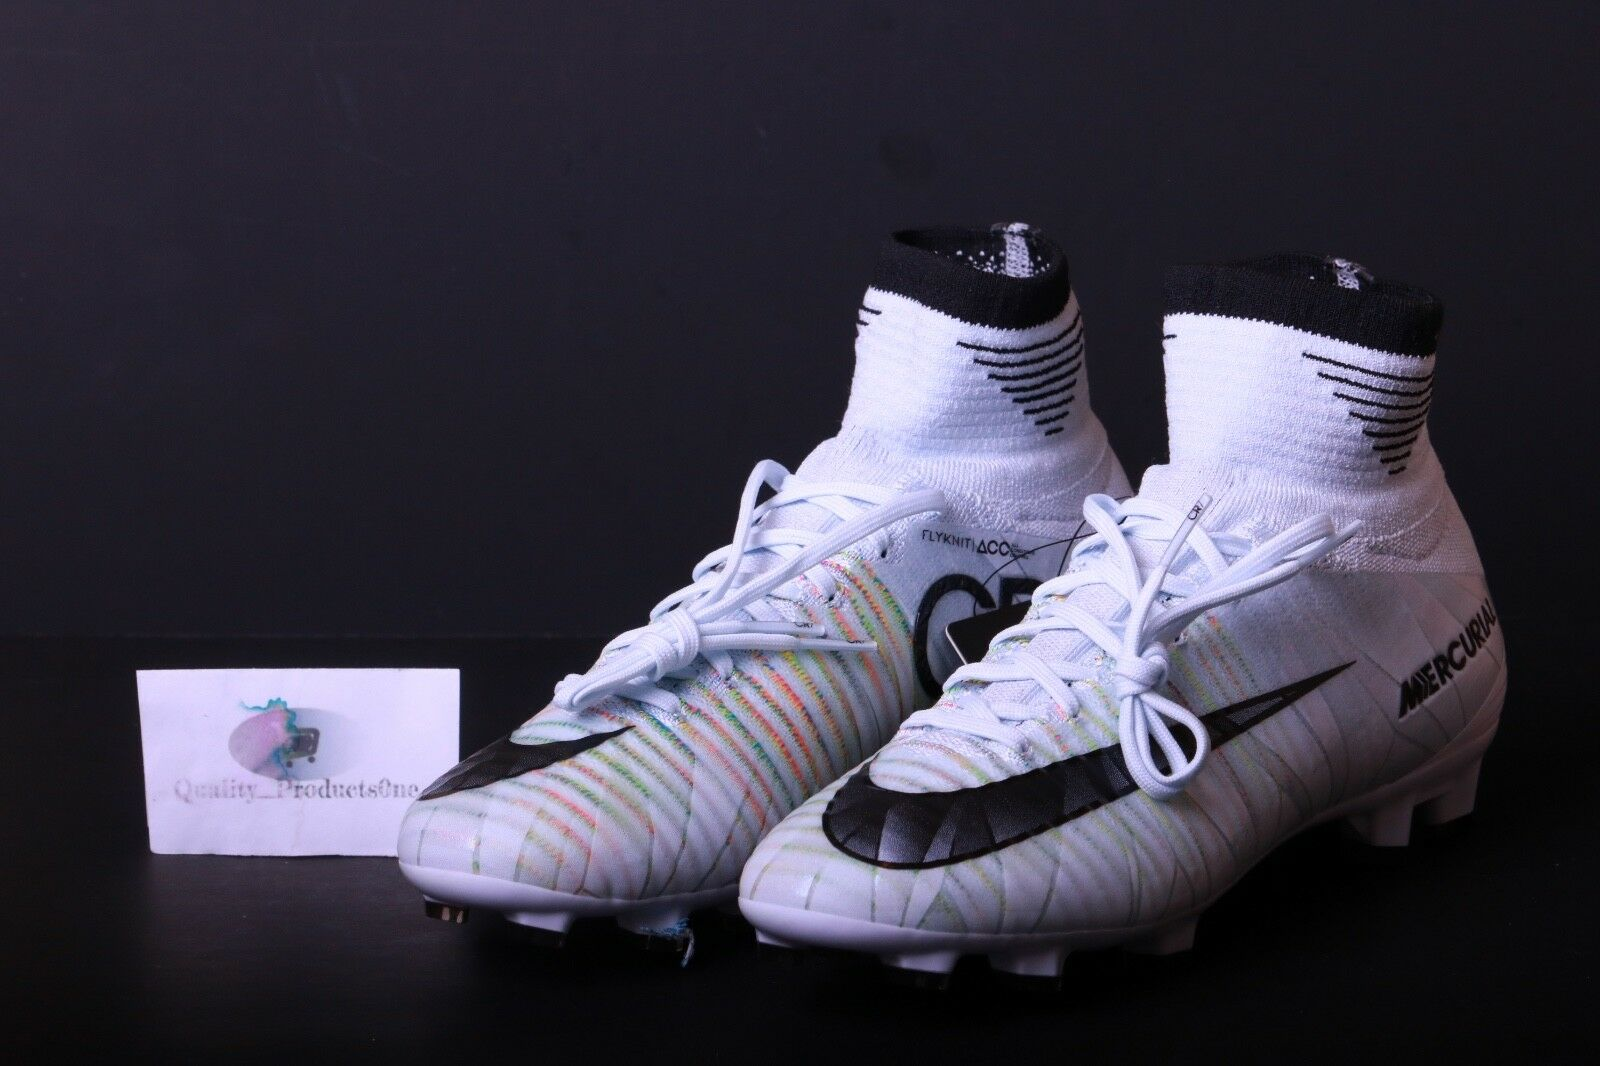 1c6ee9a2d2d Nike Jr Mercurial Superfly V DF Cr7 FG Soccer Cleats Sz 4y 922586 ...